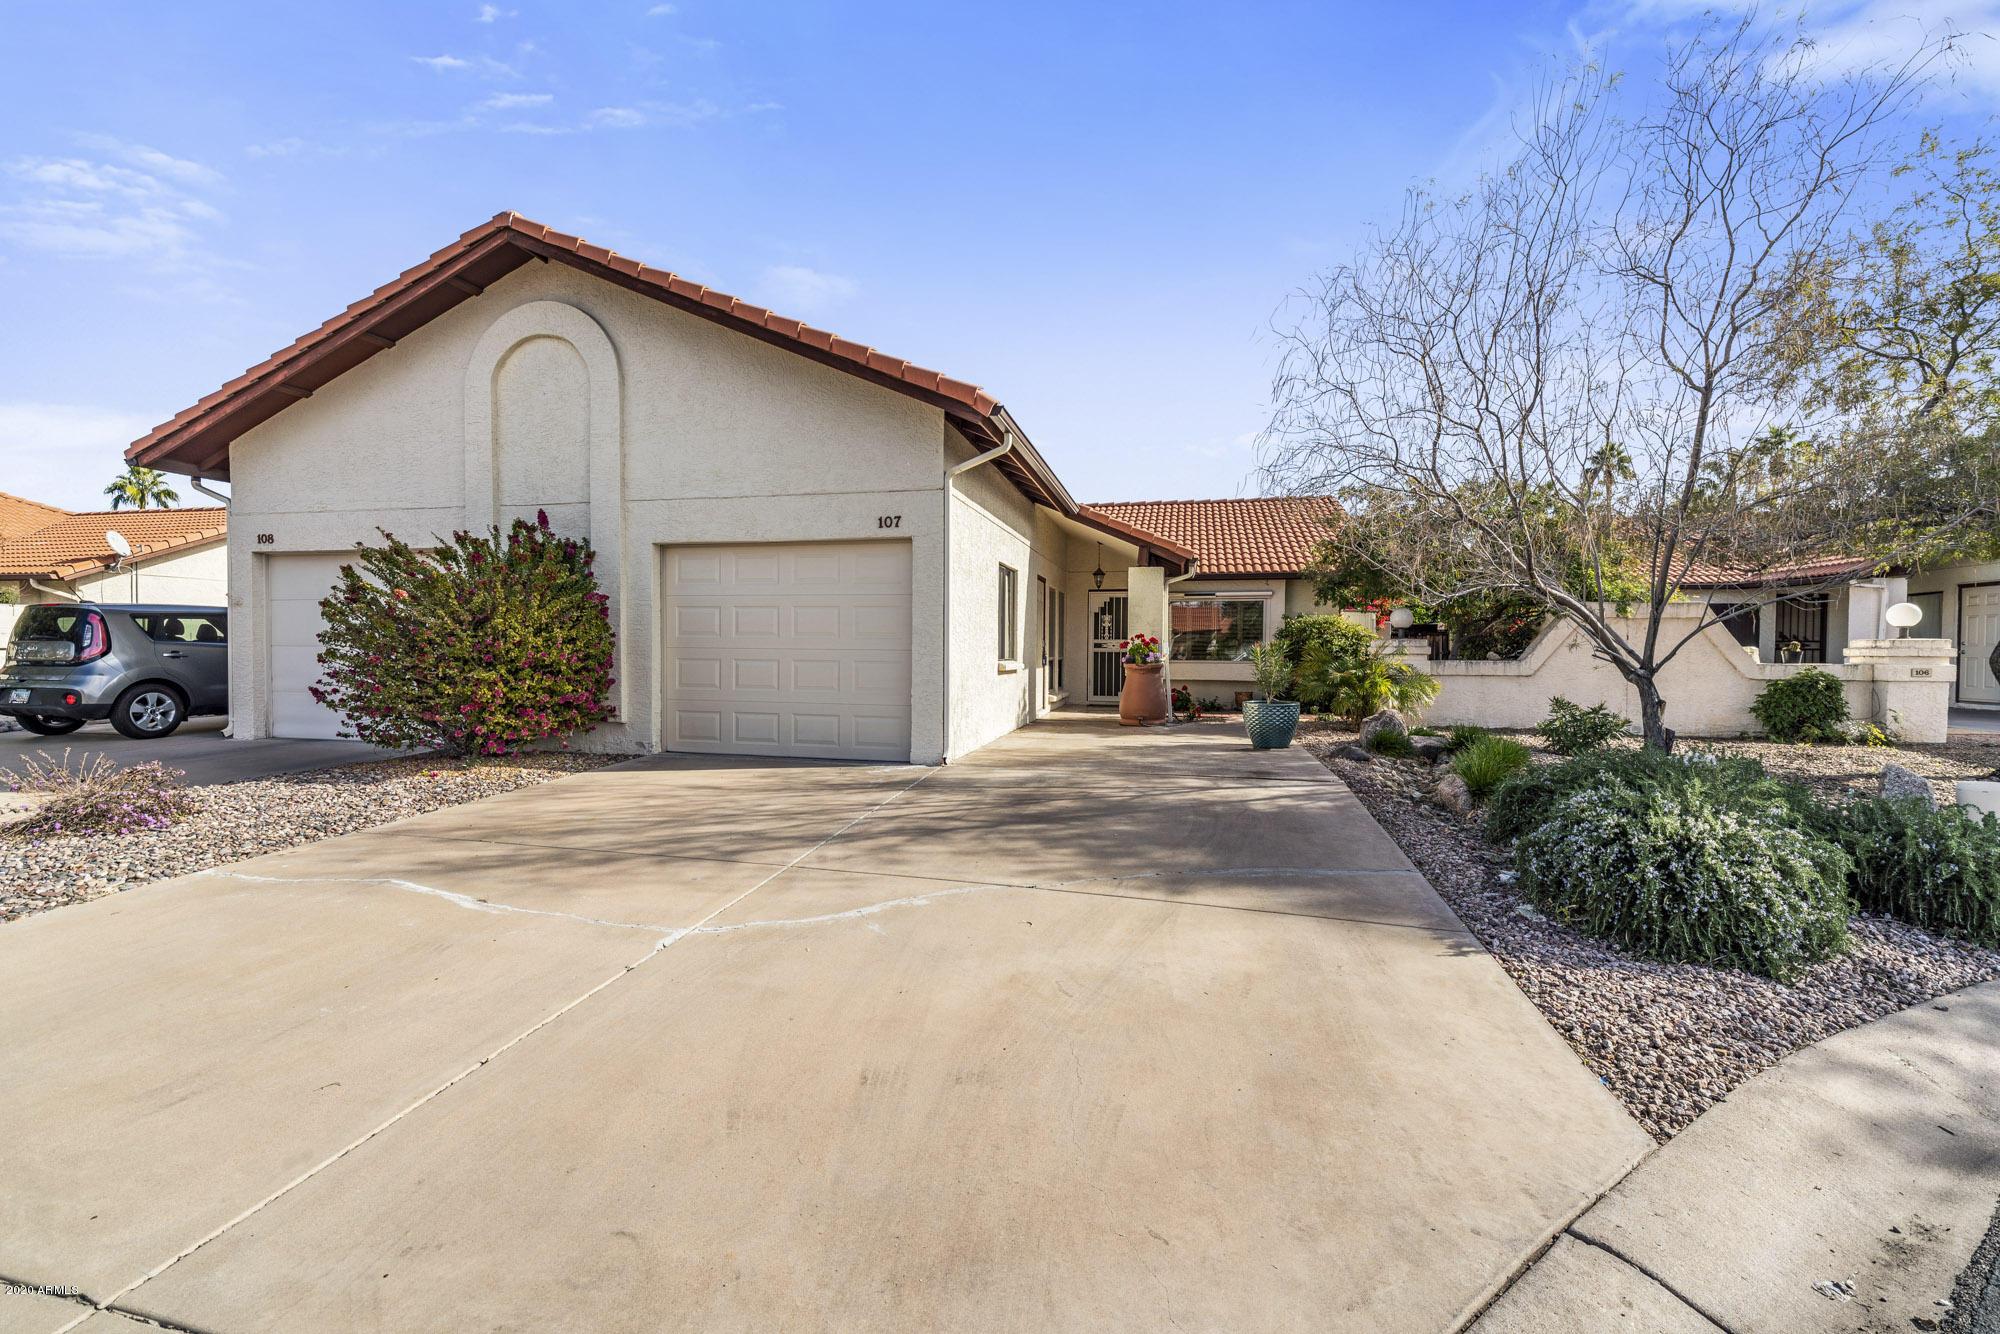 Photo of 542 S HIGLEY Road #107, Mesa, AZ 85206